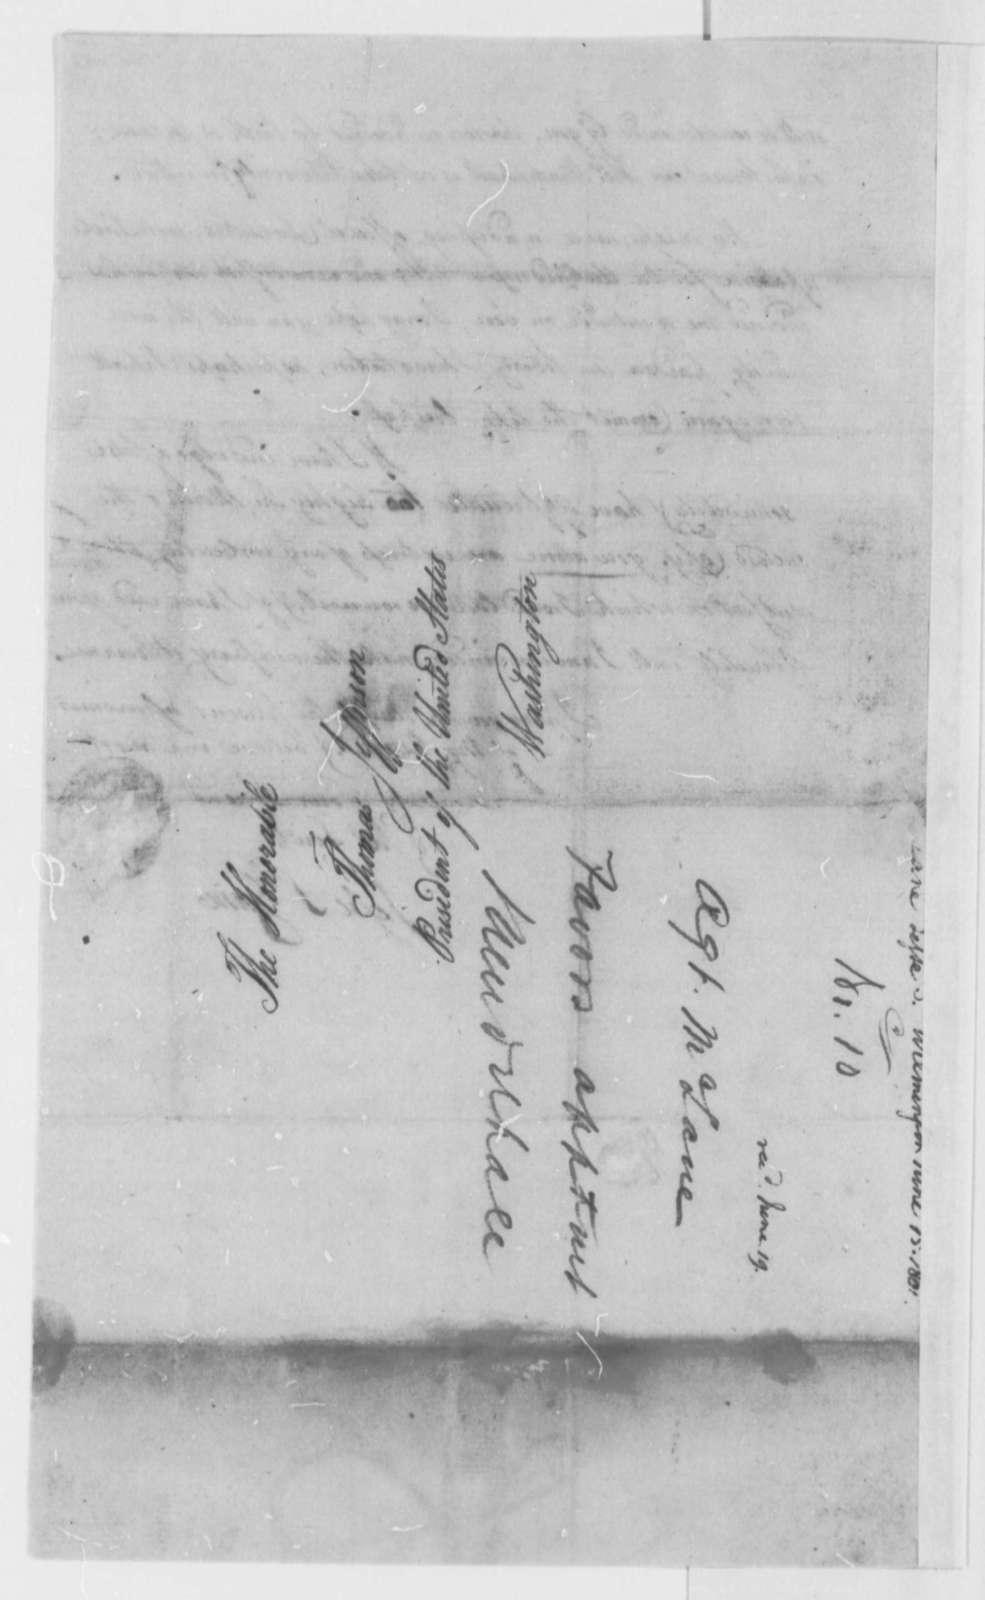 Jesse S. Zane to Thomas Jefferson, June 15, 1801